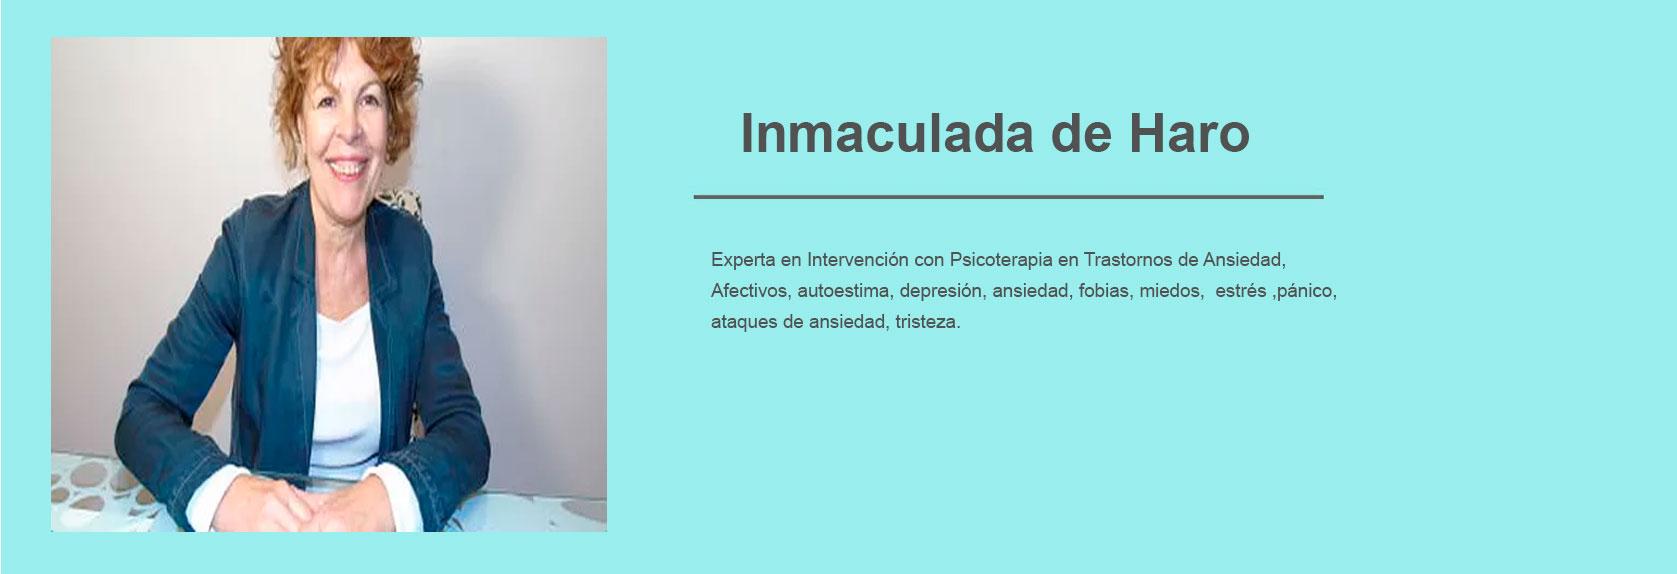 Inmaculada-de-haro-psicologa-madrid-especialista